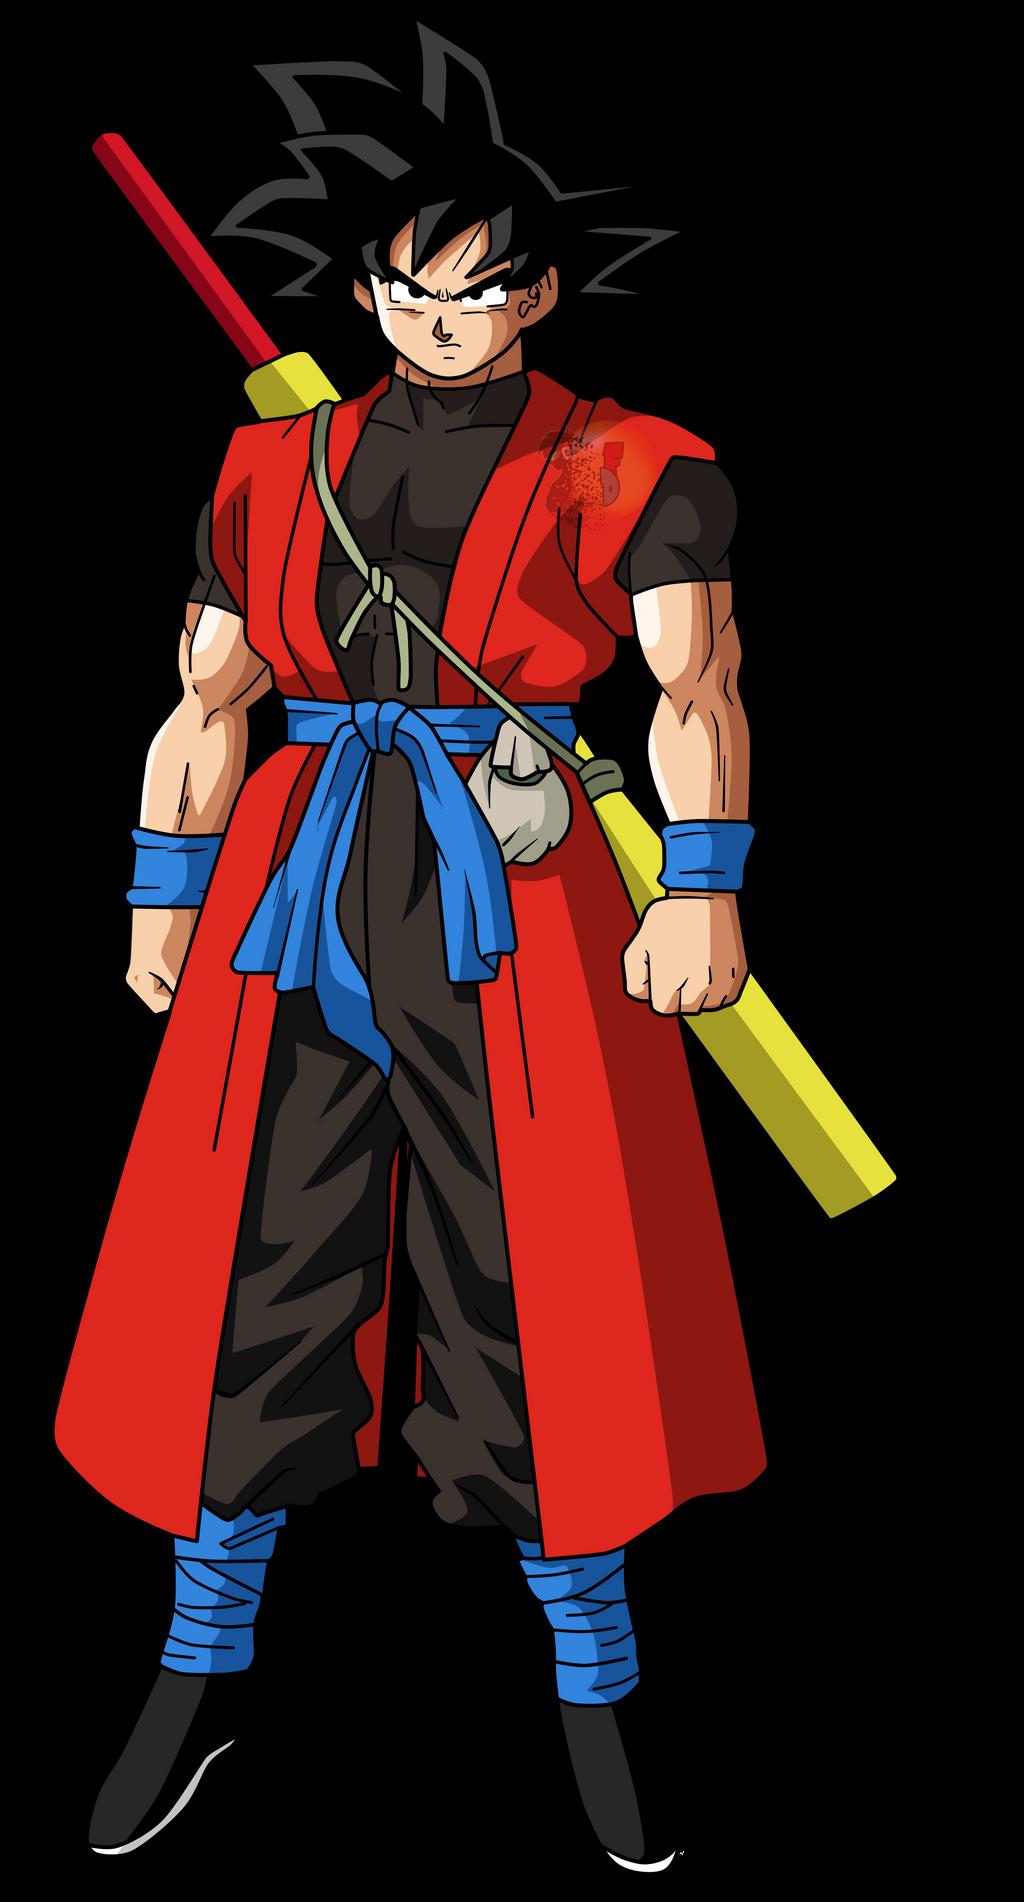 Goku xeno |FacuDibuja by FacuDibuja on DeviantArt